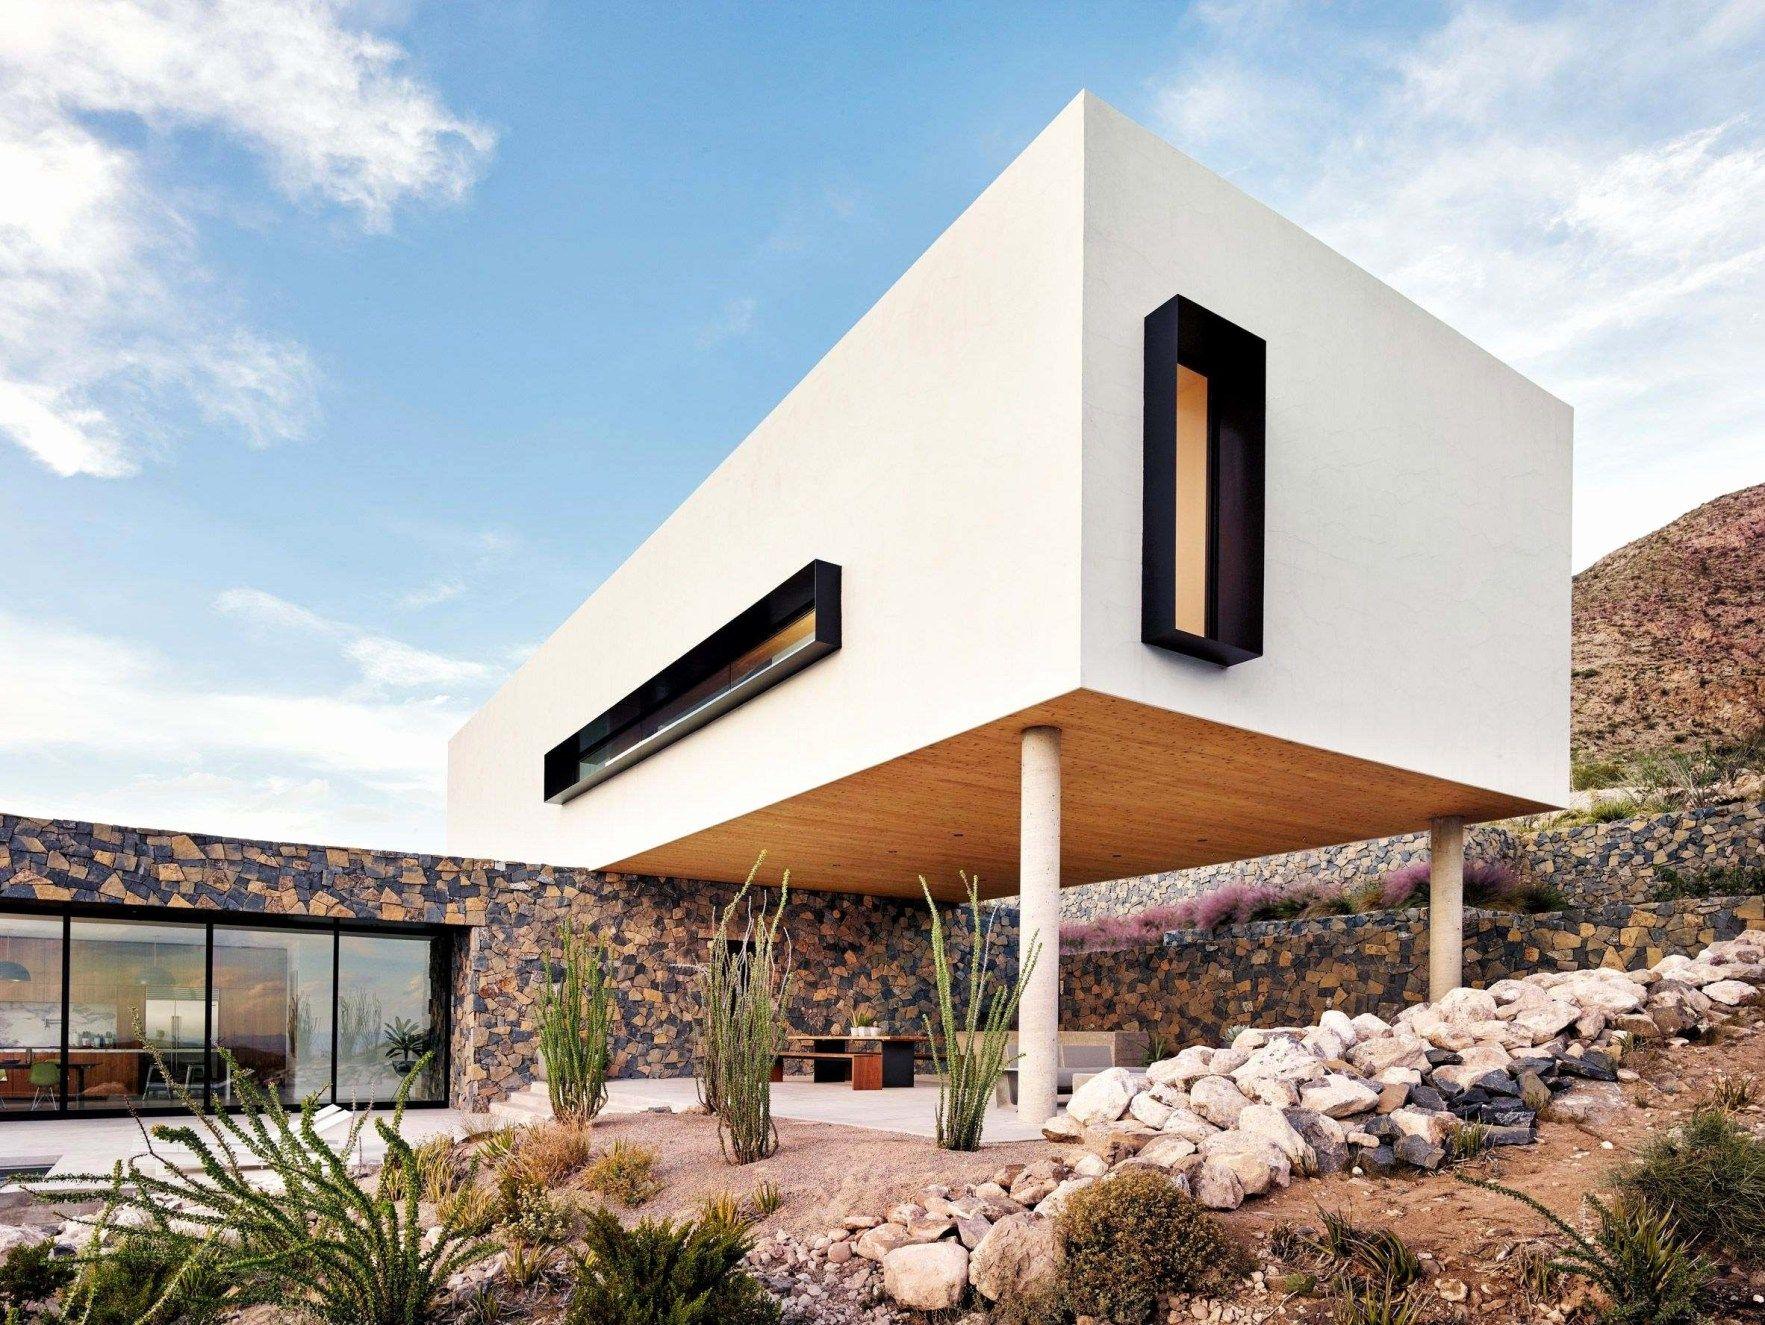 Elegant Image of Mountain Home Design Ideas Casas de